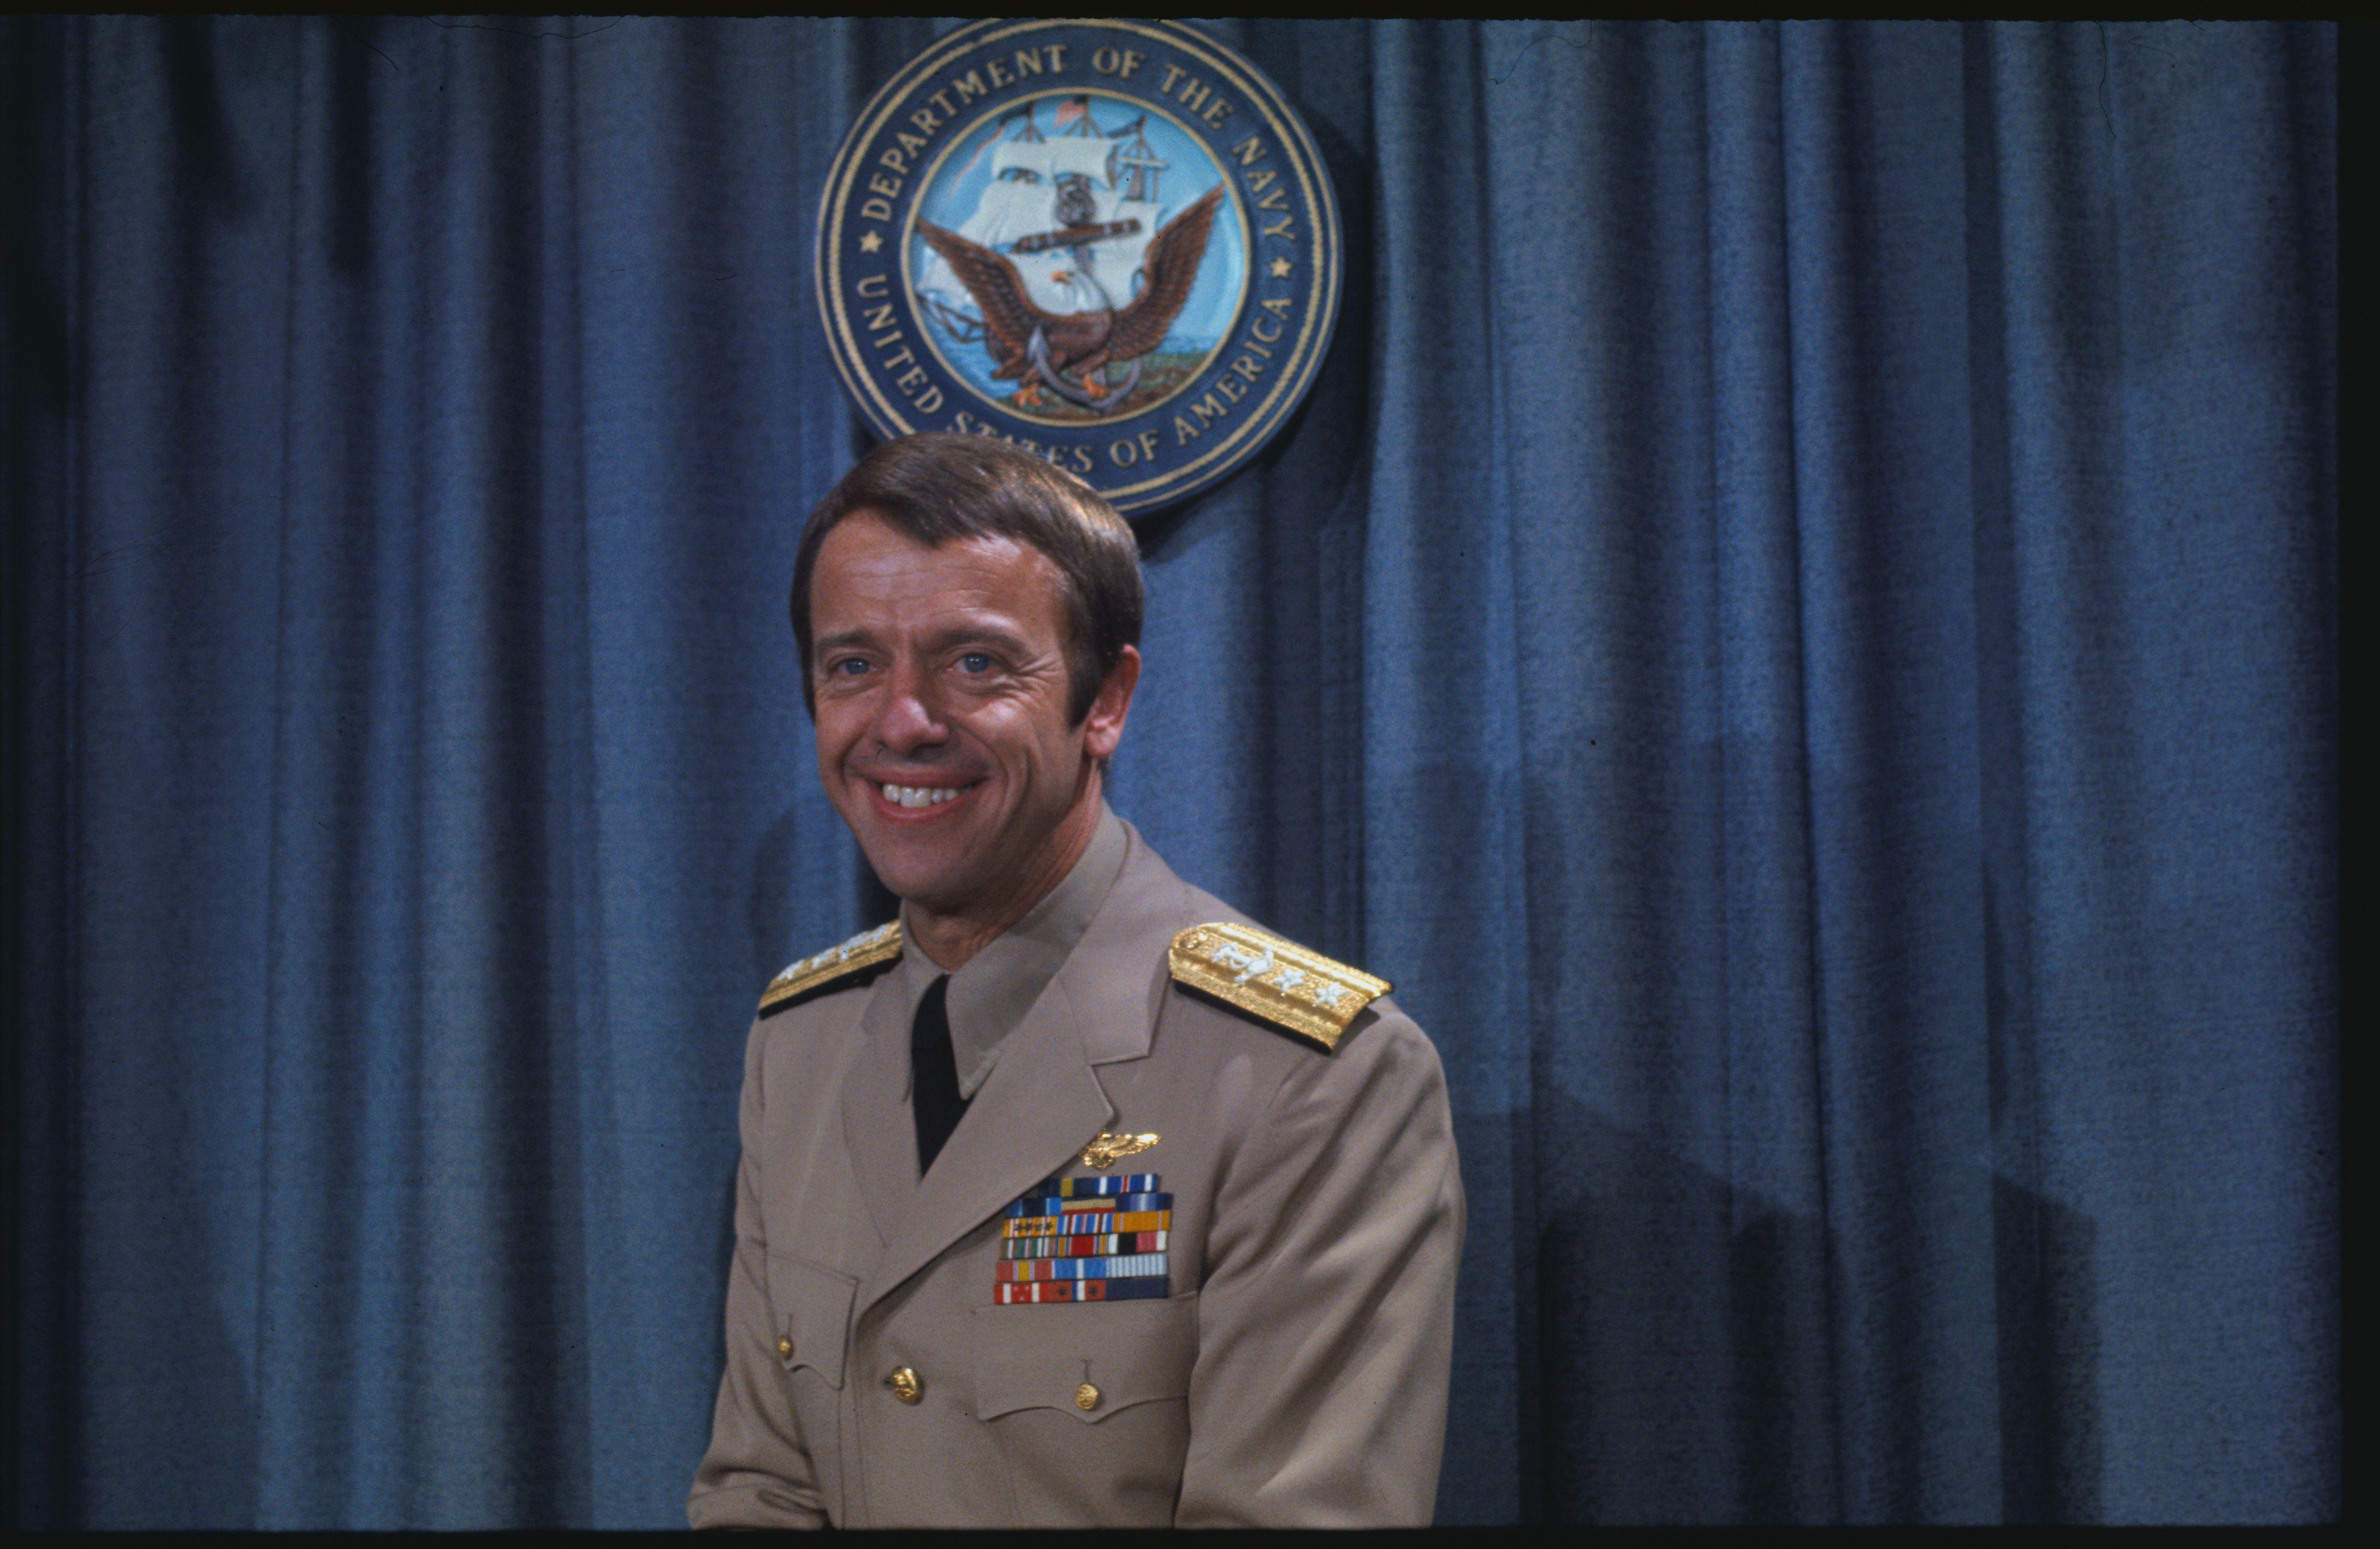 mxcpastronaut-alan-shepard-smiling-517261850-b89992c3775e4beda37c985365039295.jpg